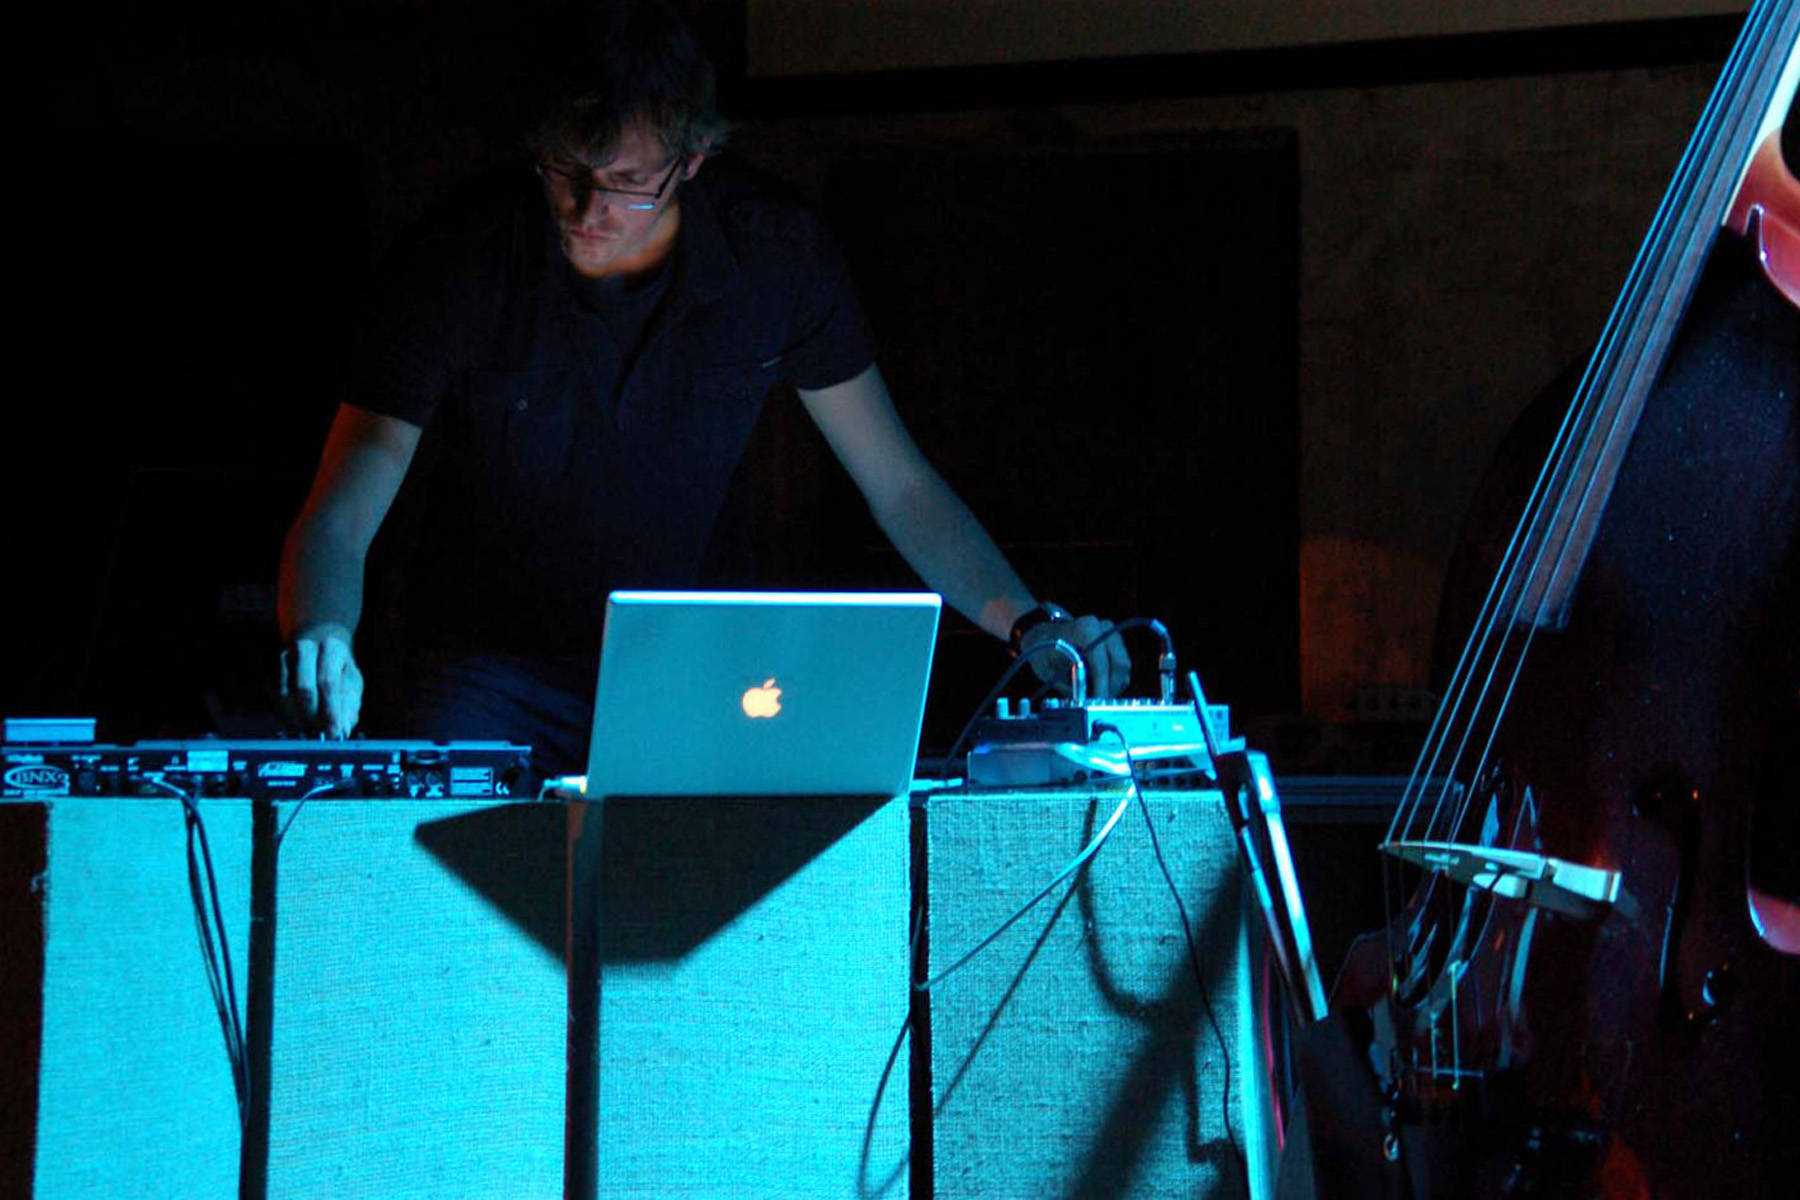 Michele Spanghero, Desmodrone, 2010, performance, Kaunas